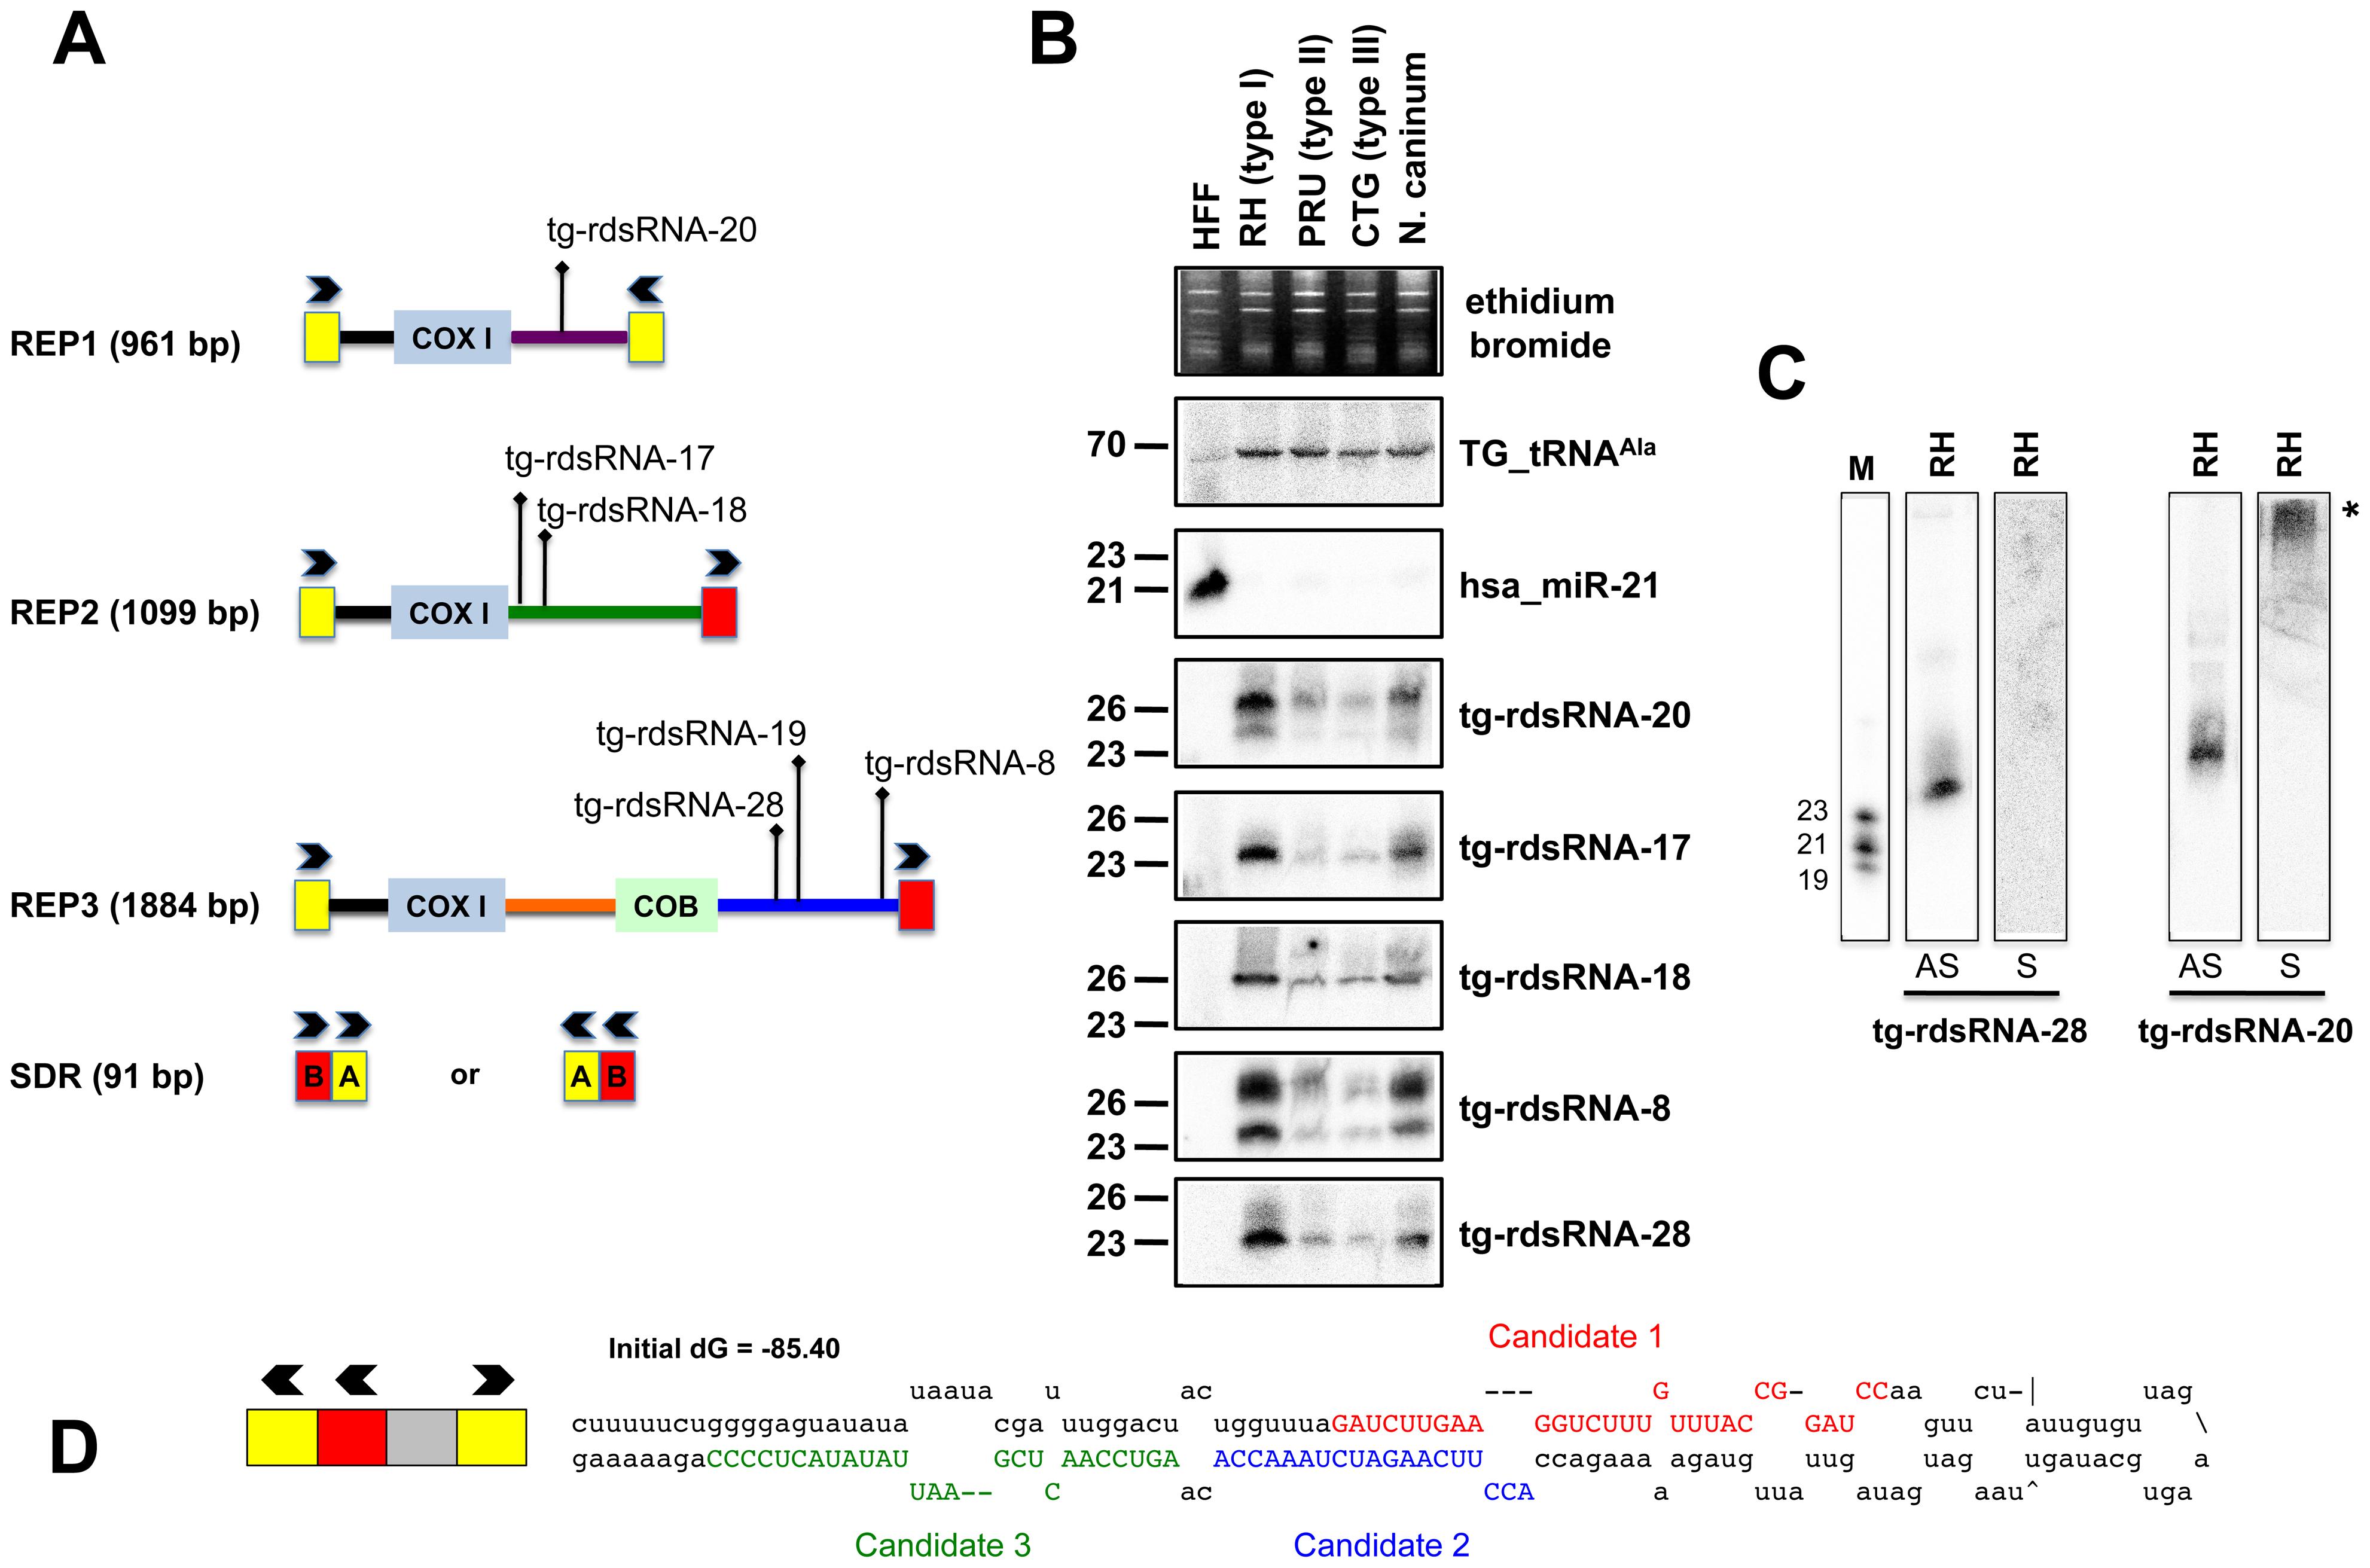 Expression patterns and characteristics of repeat-associated <i>Tg</i>-rdsRNA in <i>Toxoplasma</i>.